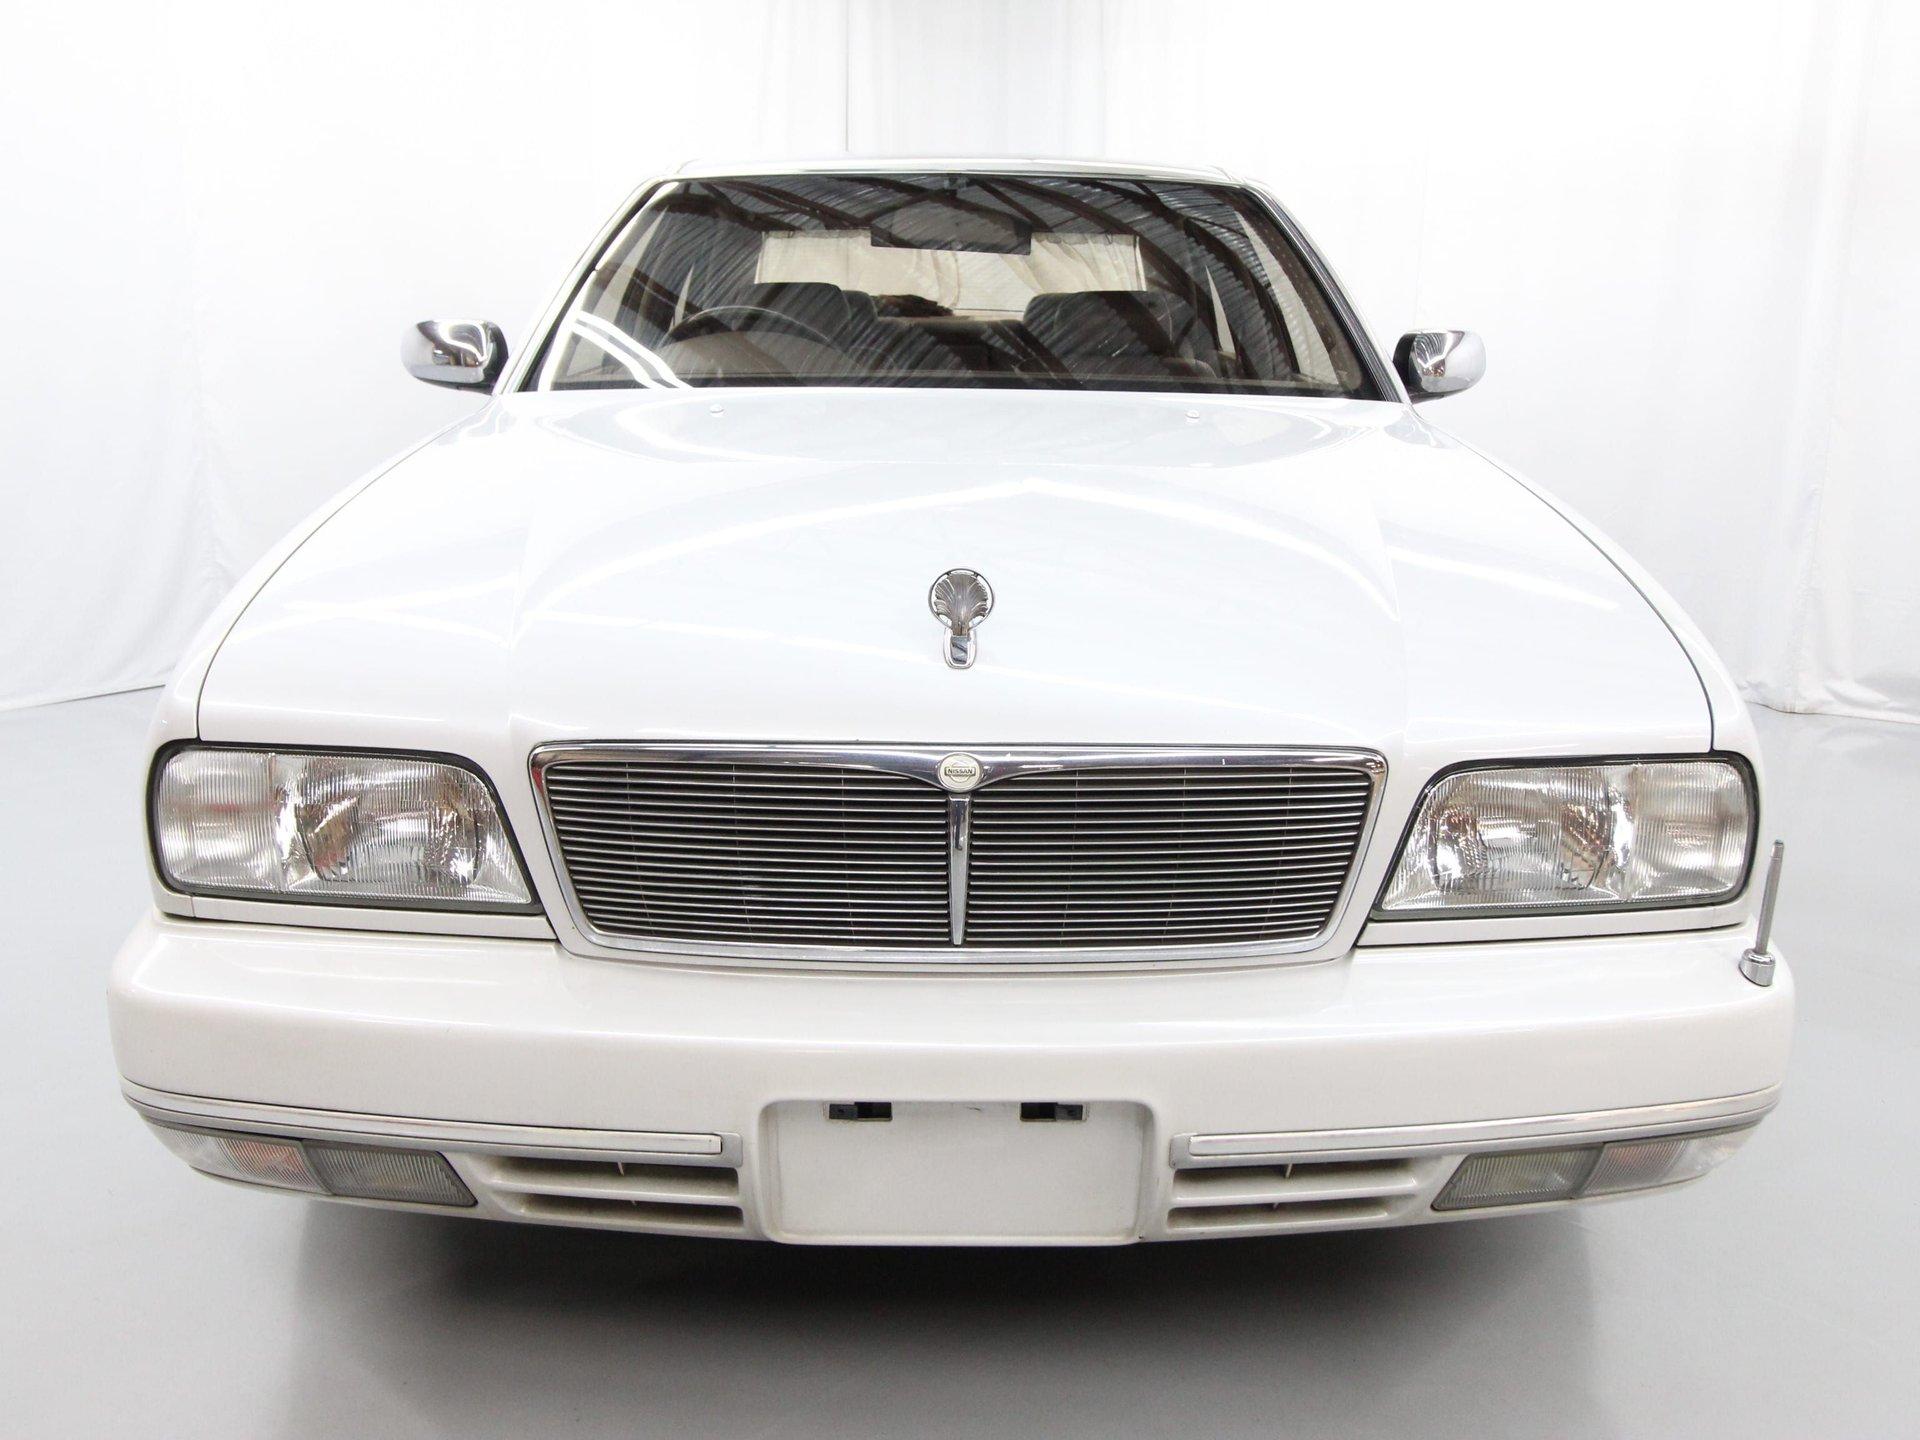 1994 Nissan Cima